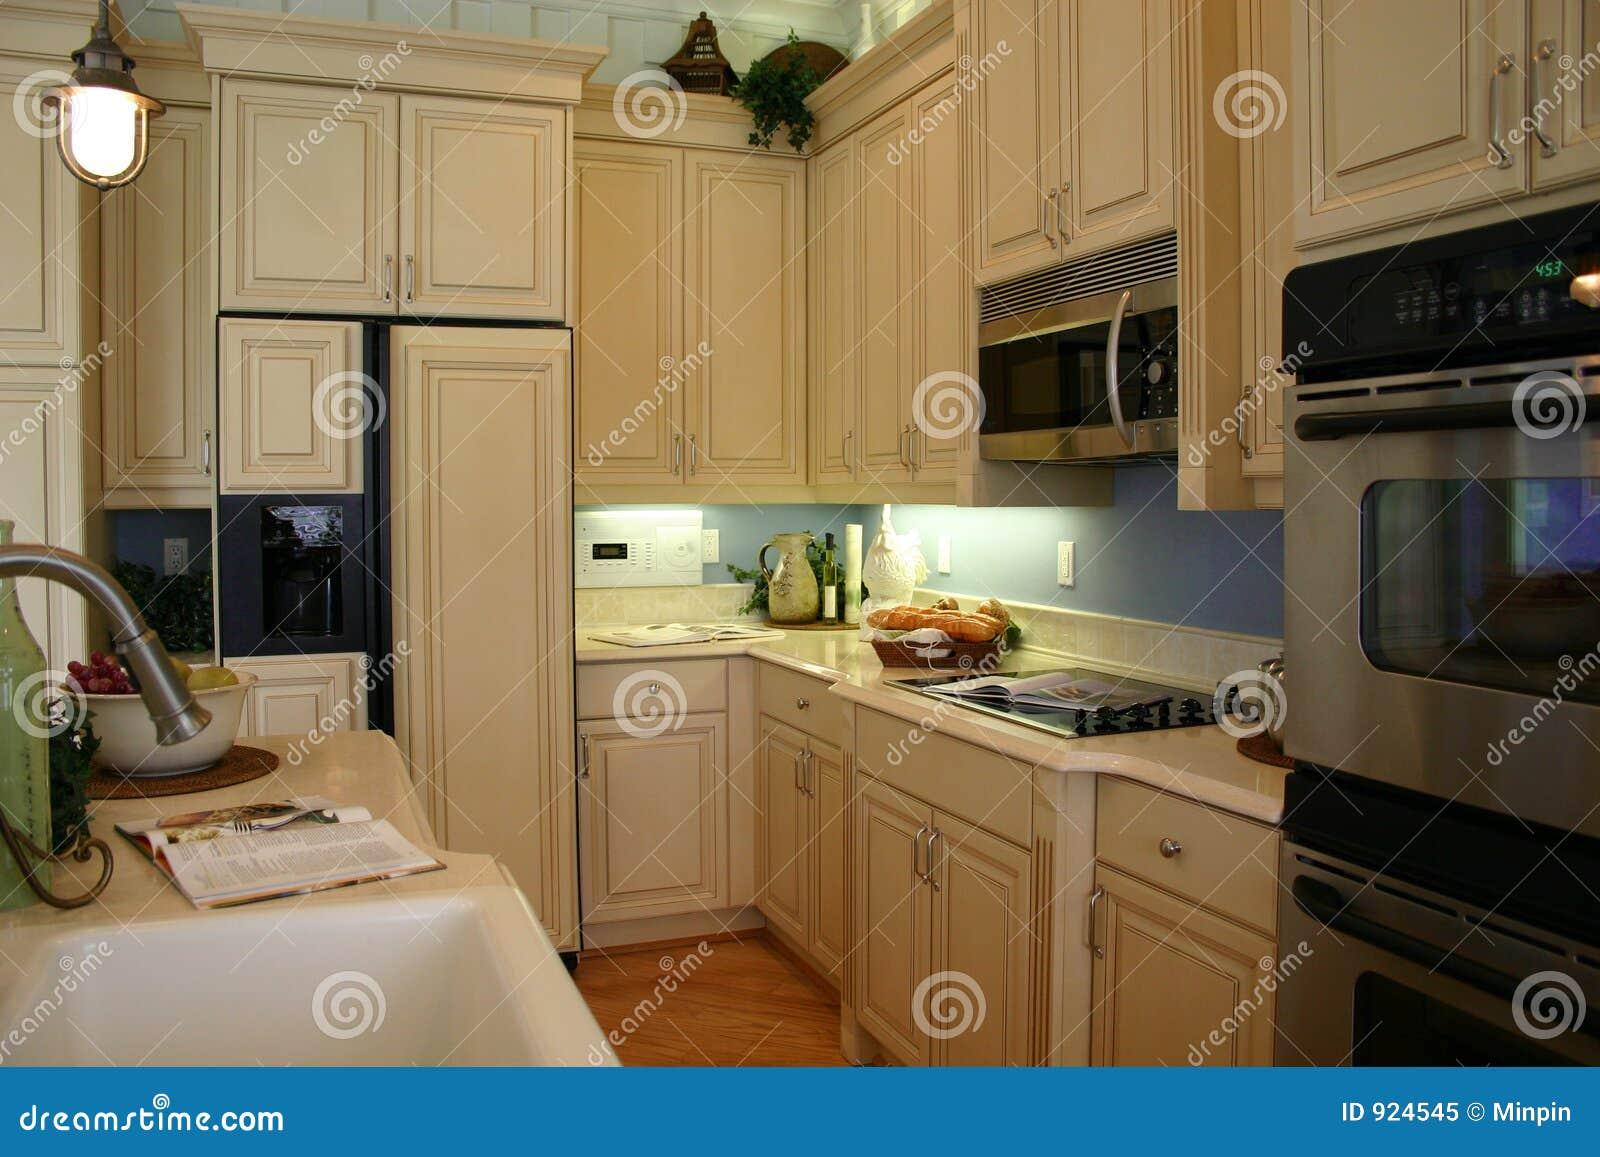 Efficient Kitchen Royalty Free Stock Photo Image 924545